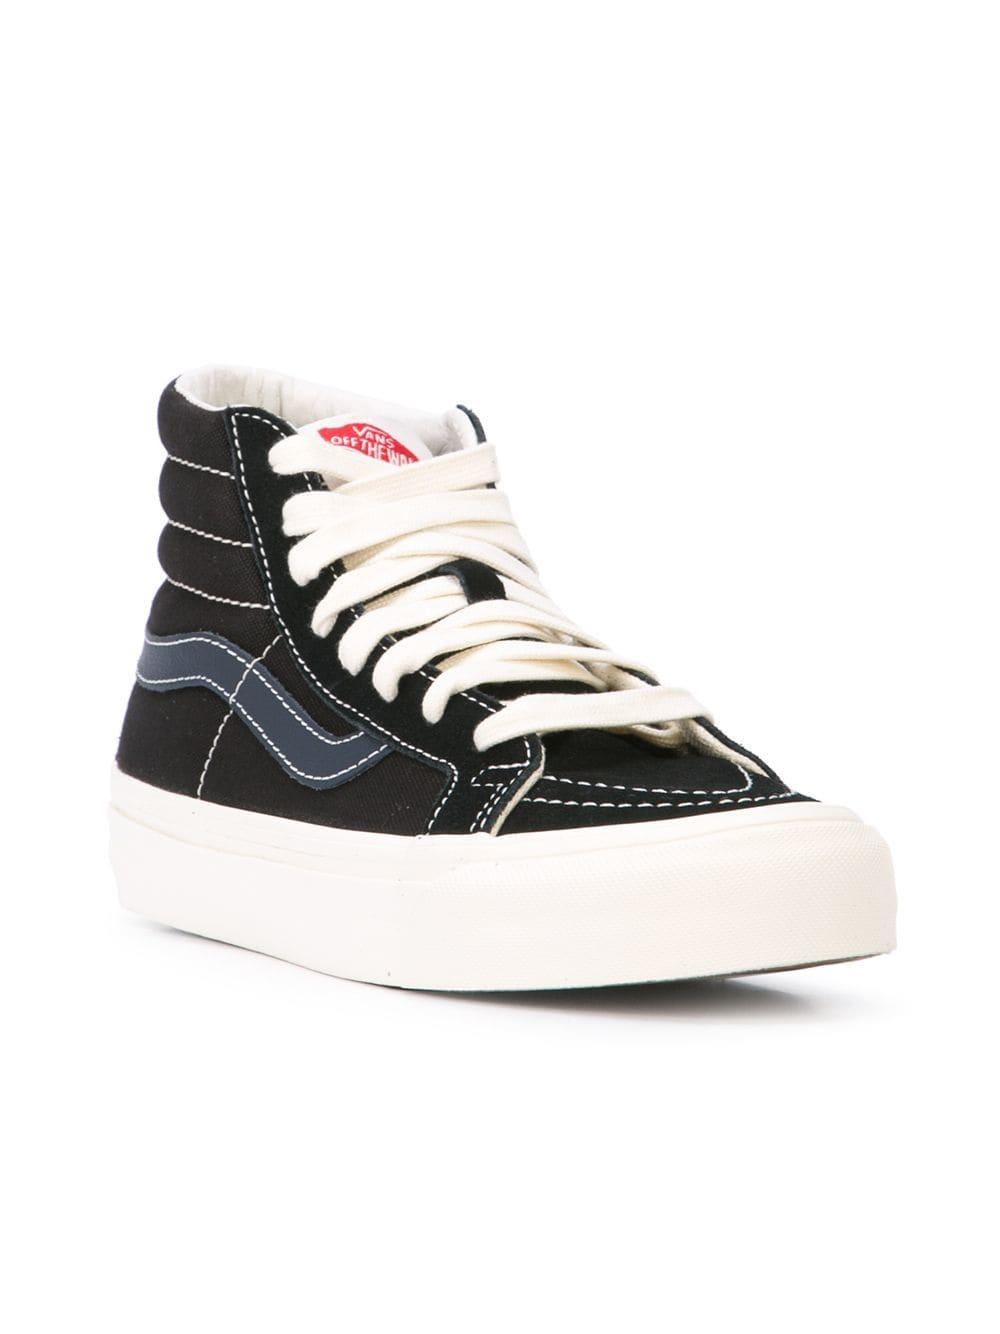 cd307f89088fd3 Vans Og Sk8-hi Lx Sneakers in Black for Men - Lyst